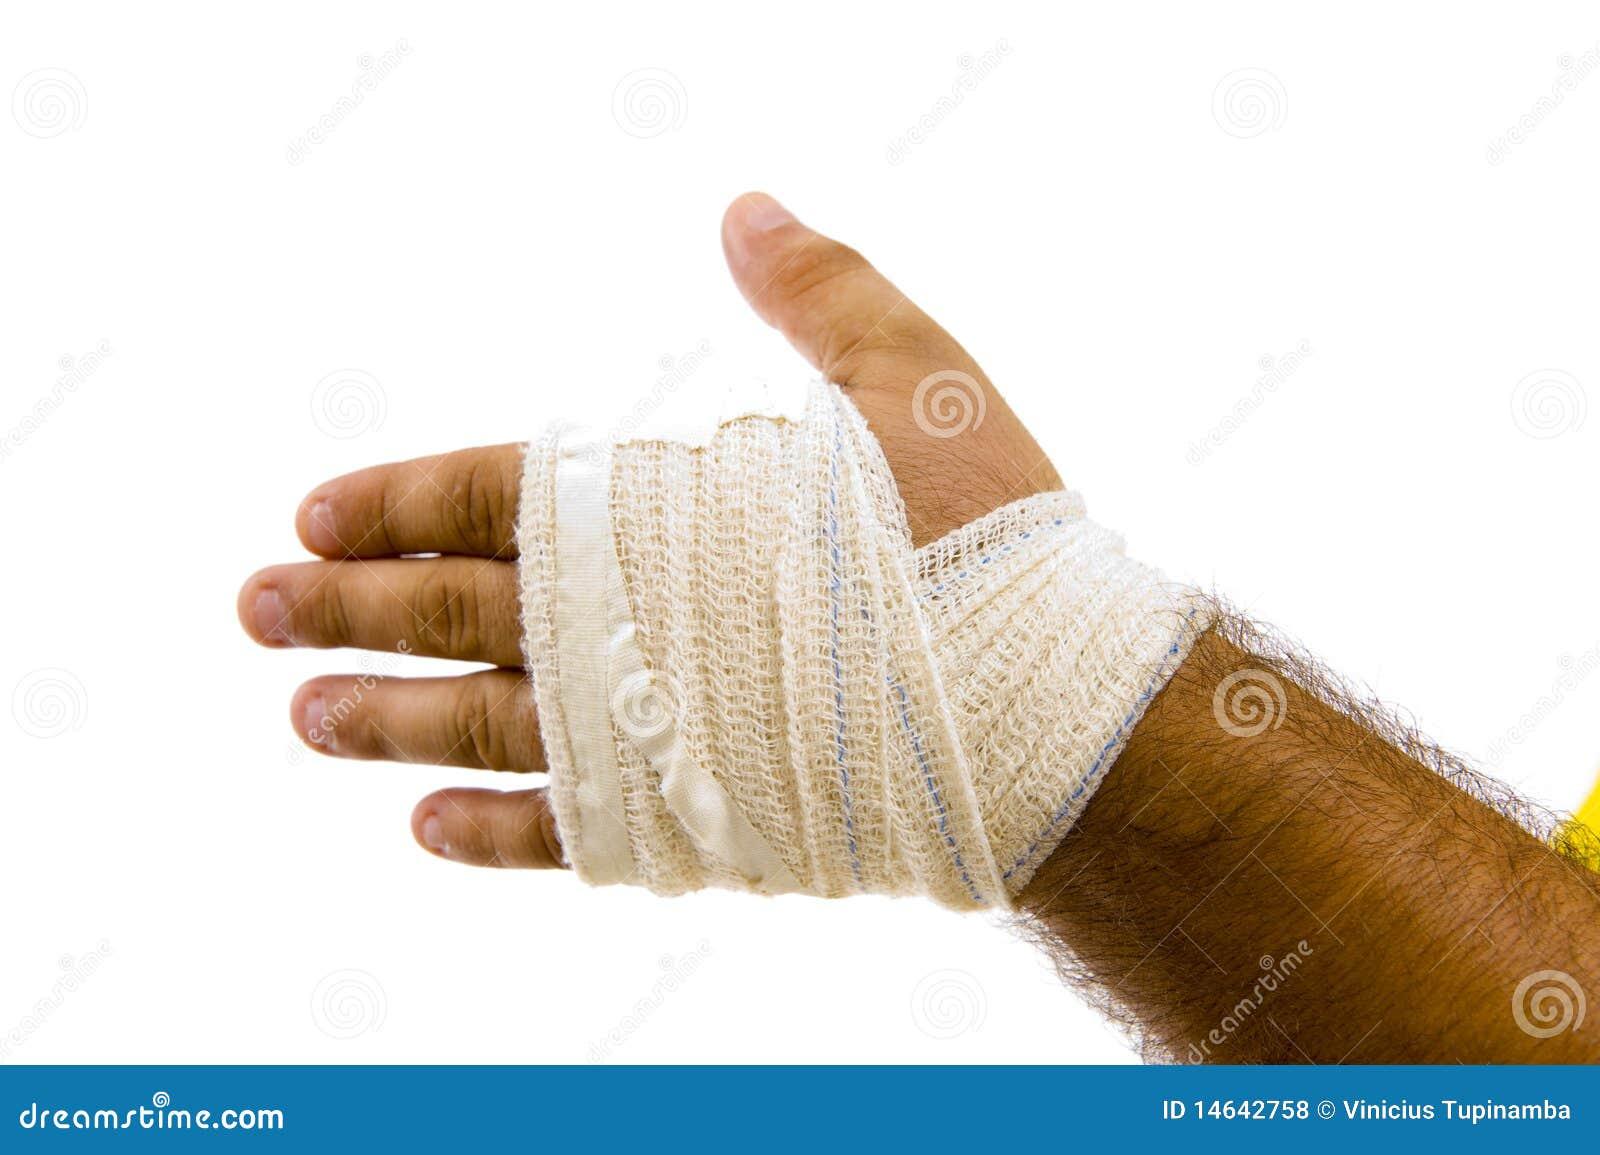 Bandaged Hand Related Keywords & Suggestions - Bandaged Hand Long Tail ...